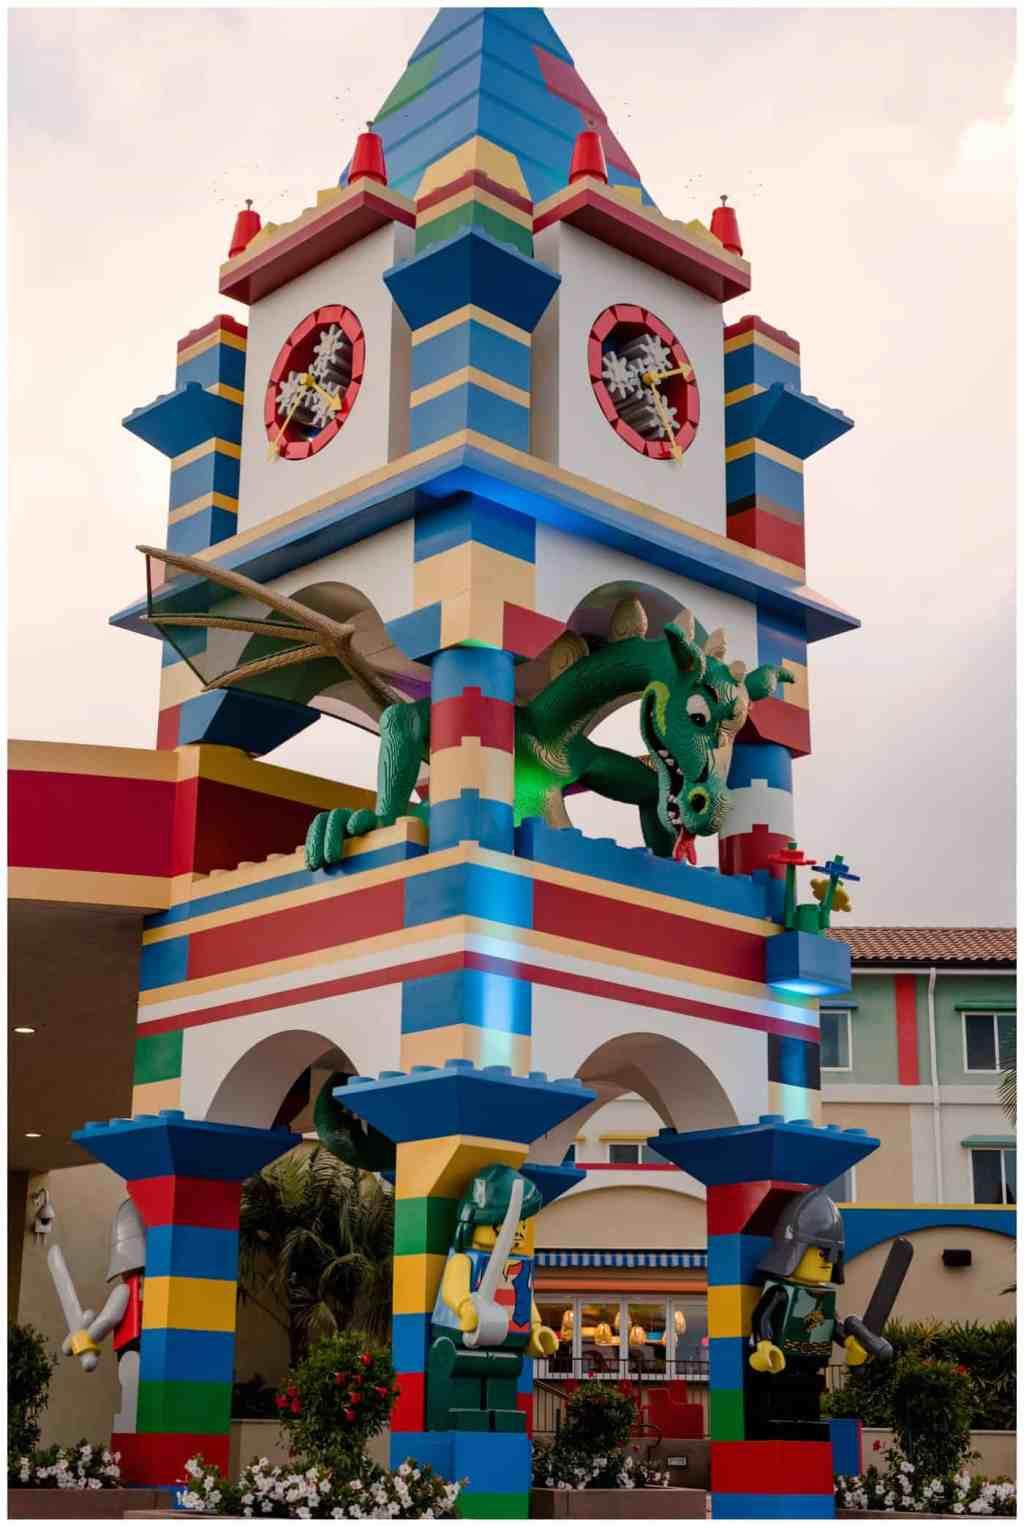 Regina Family Photography - Legoland California - Liske Family Travels - Legoland Hotel - Carlsbad